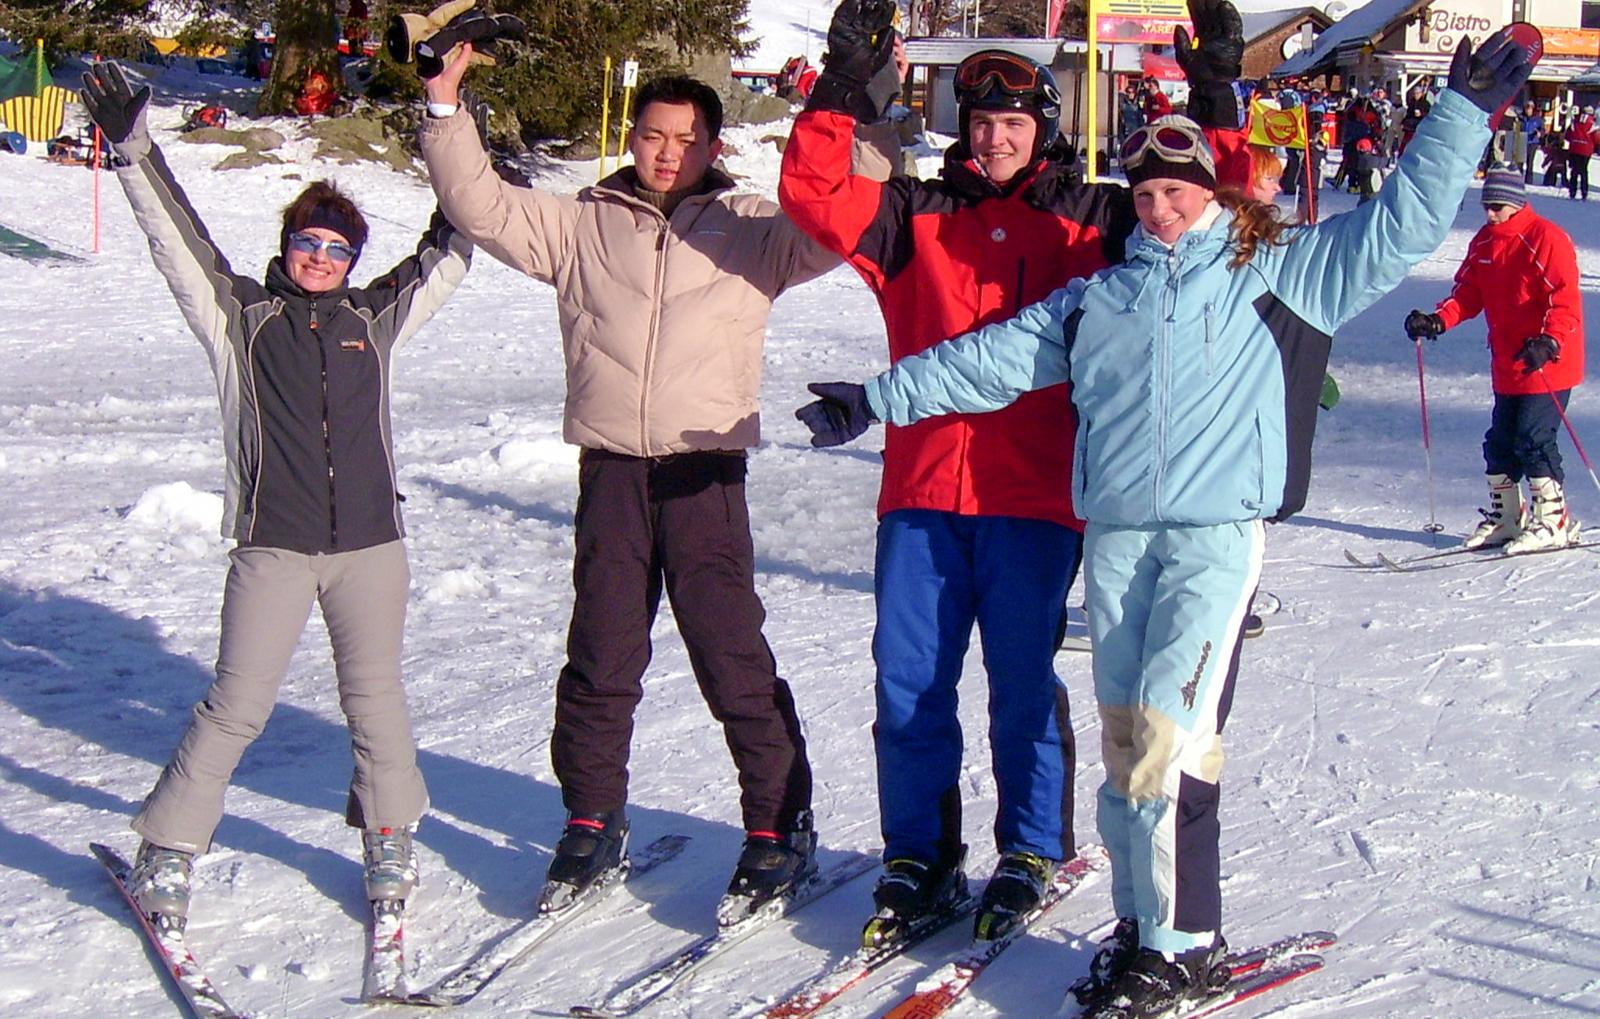 1-taegiger-skikurs-am-feldberg-bg3